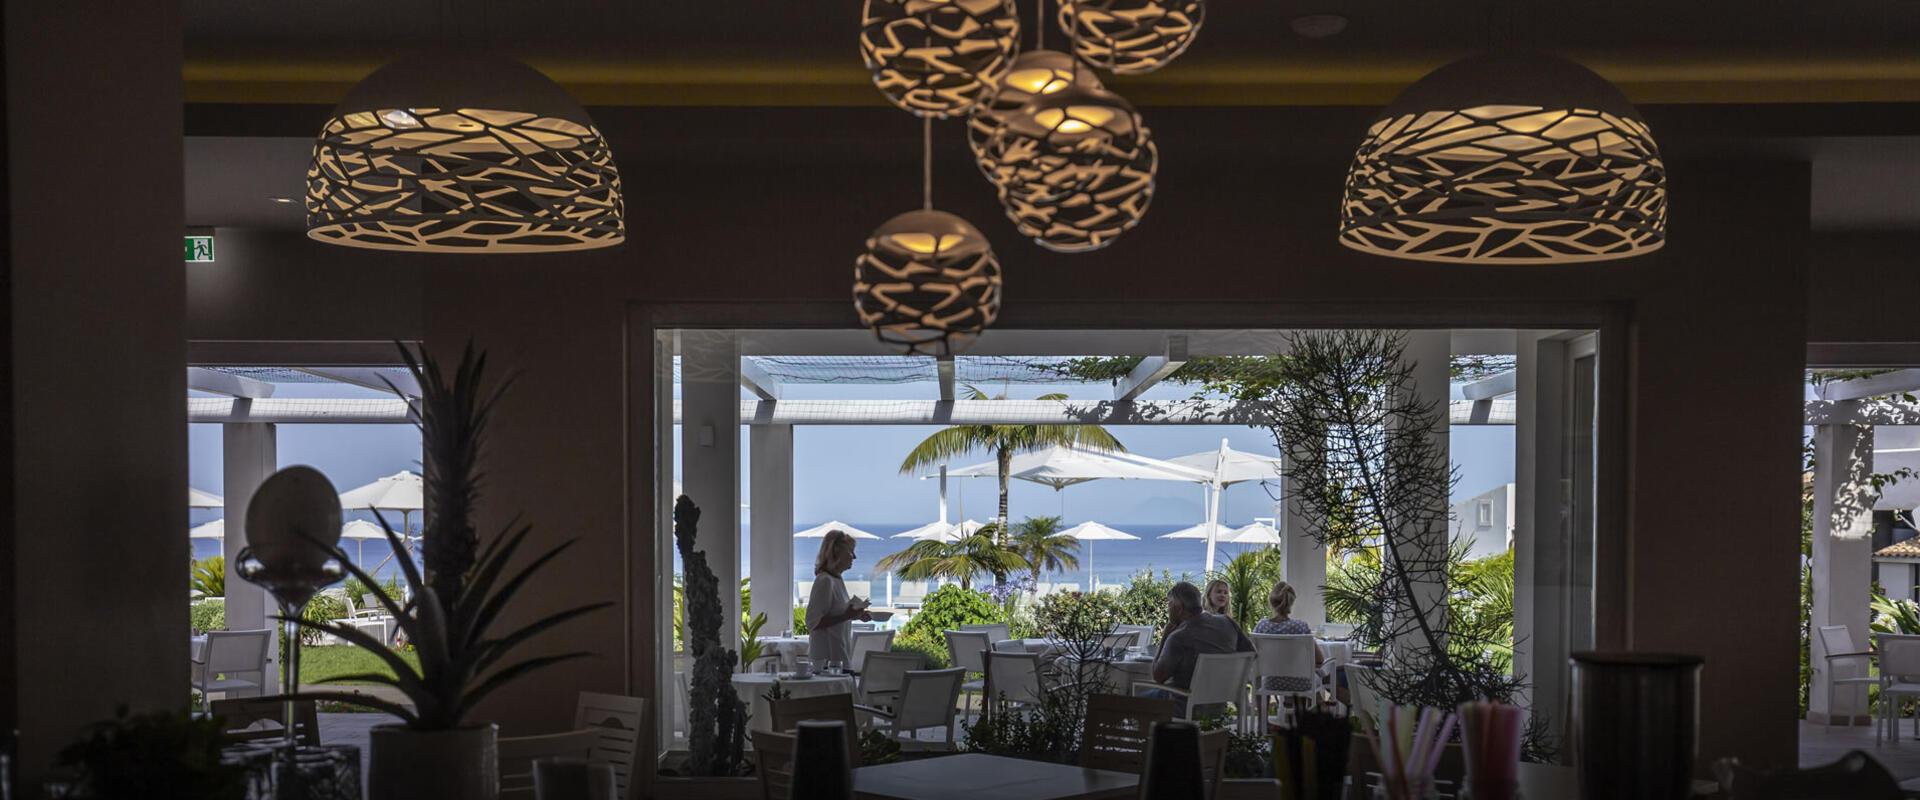 borgodonnacanfora fr restaurant 002